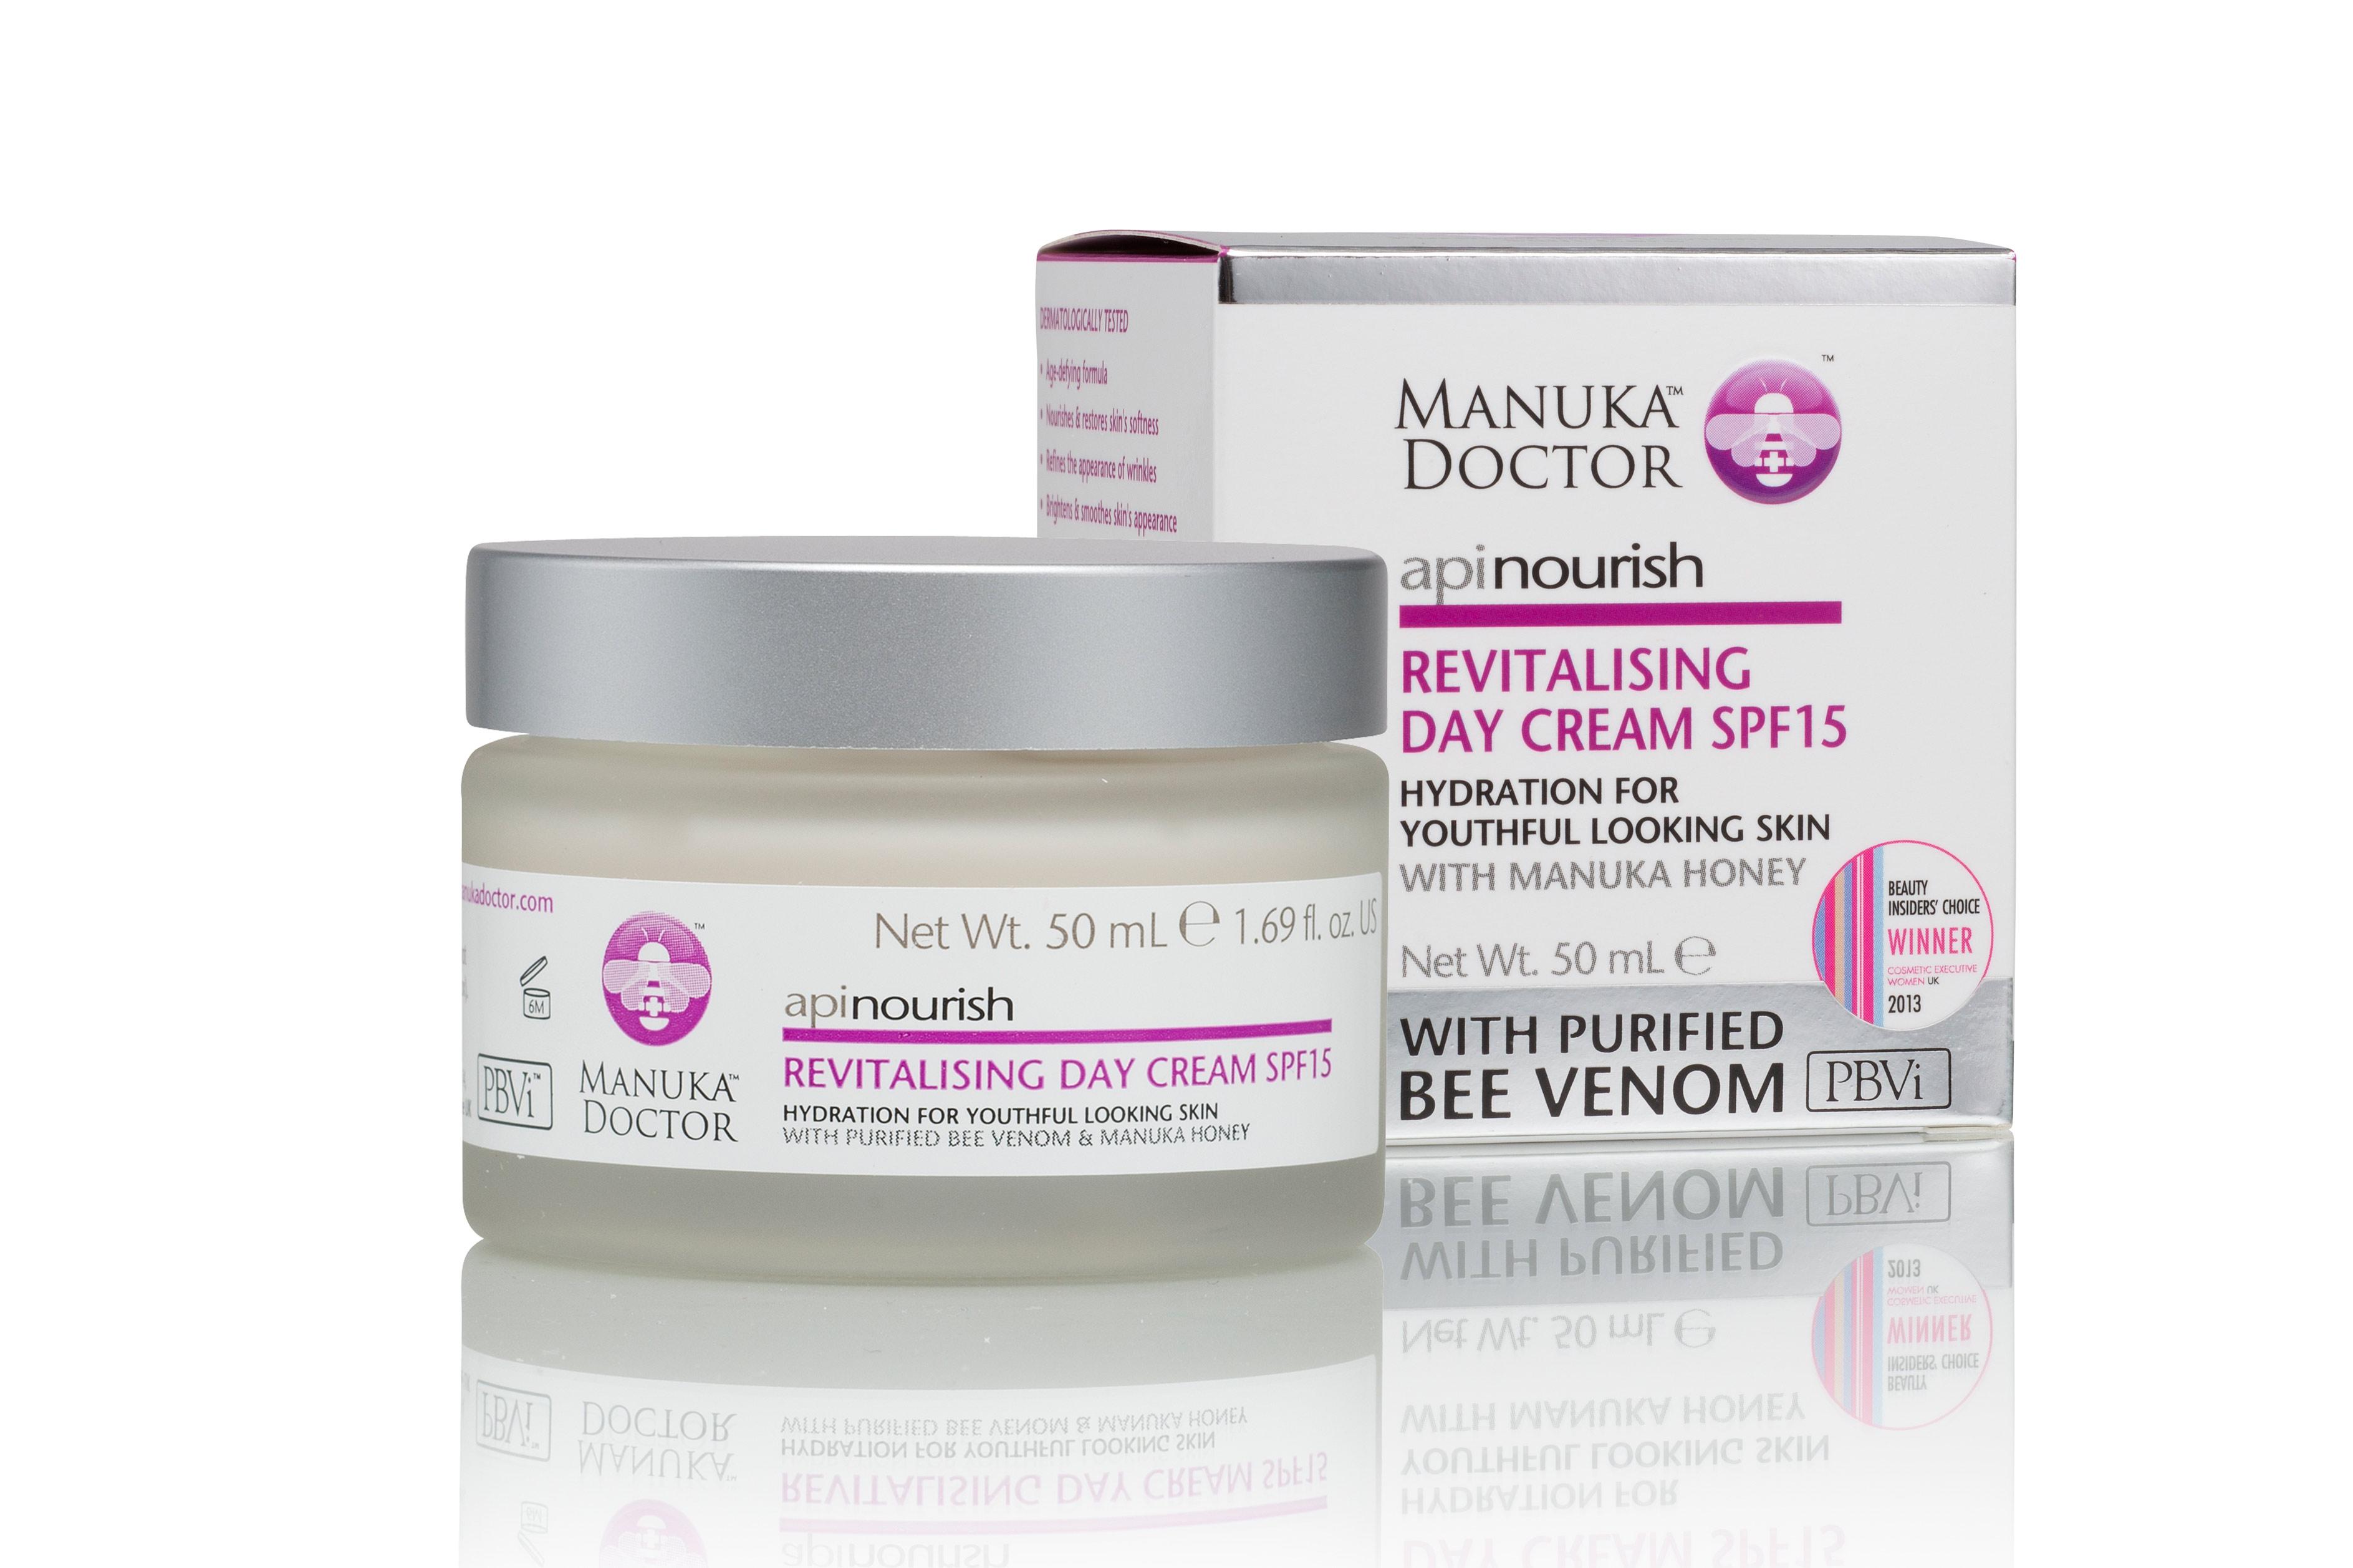 Manuka-Doctor-ApiNourish-Revitalising-Day-Cream-SPF15